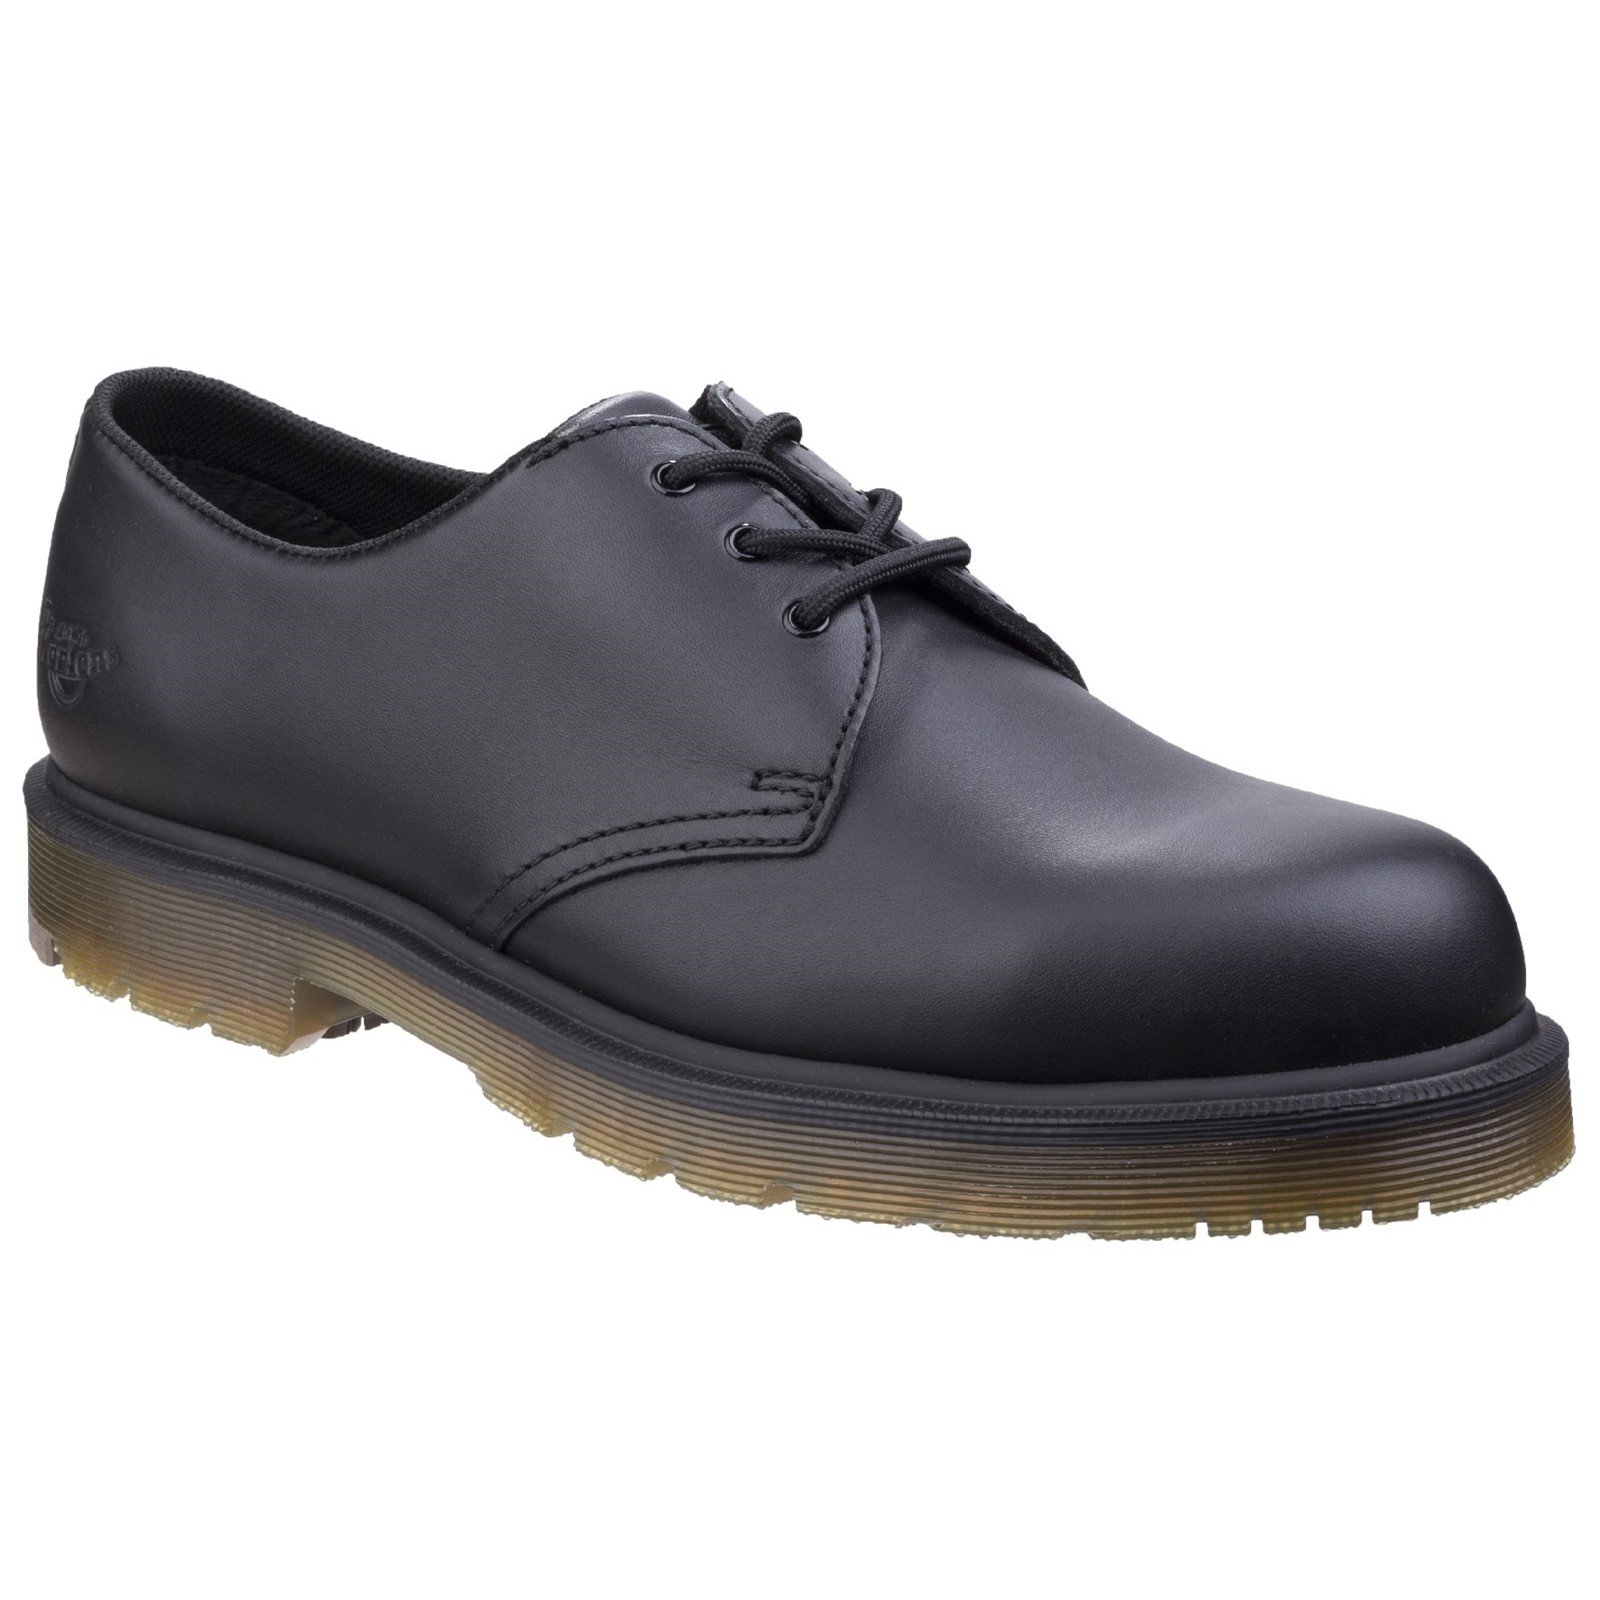 Dr Martens Men's Arlington NS Derby Shoe Black 26781 - Black Industrial Full Grain 4